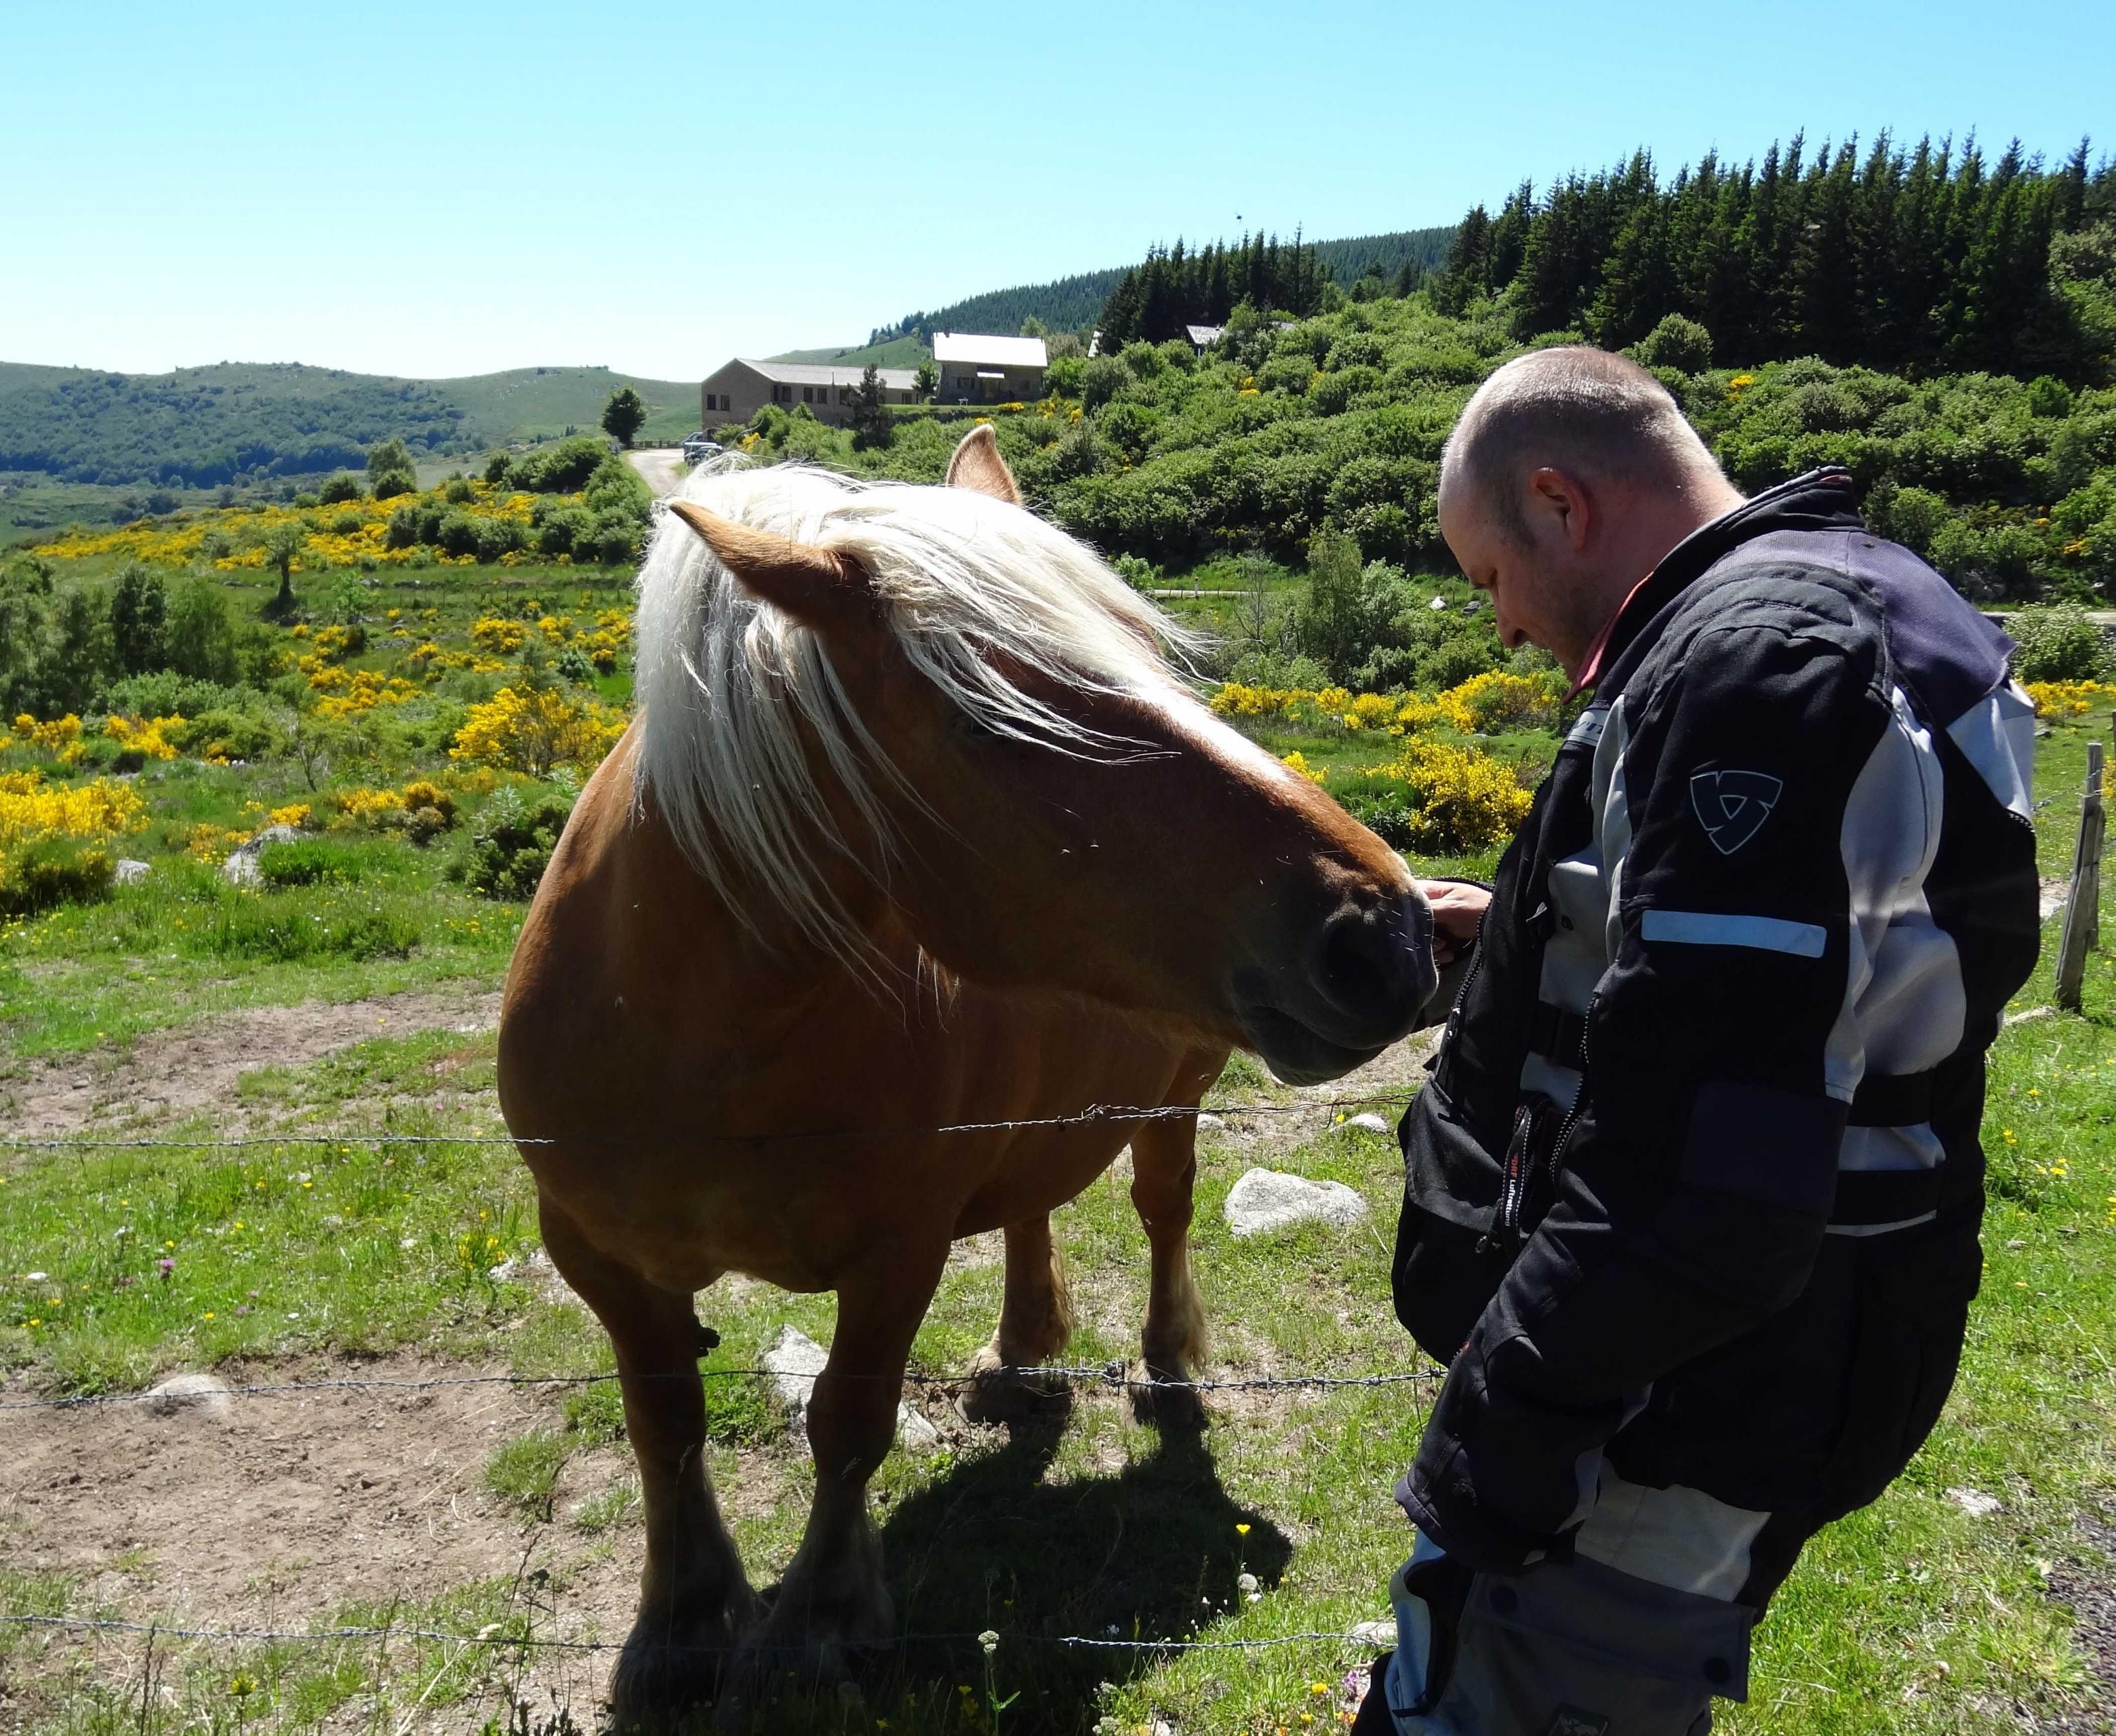 boro-mit-pferd.jpg